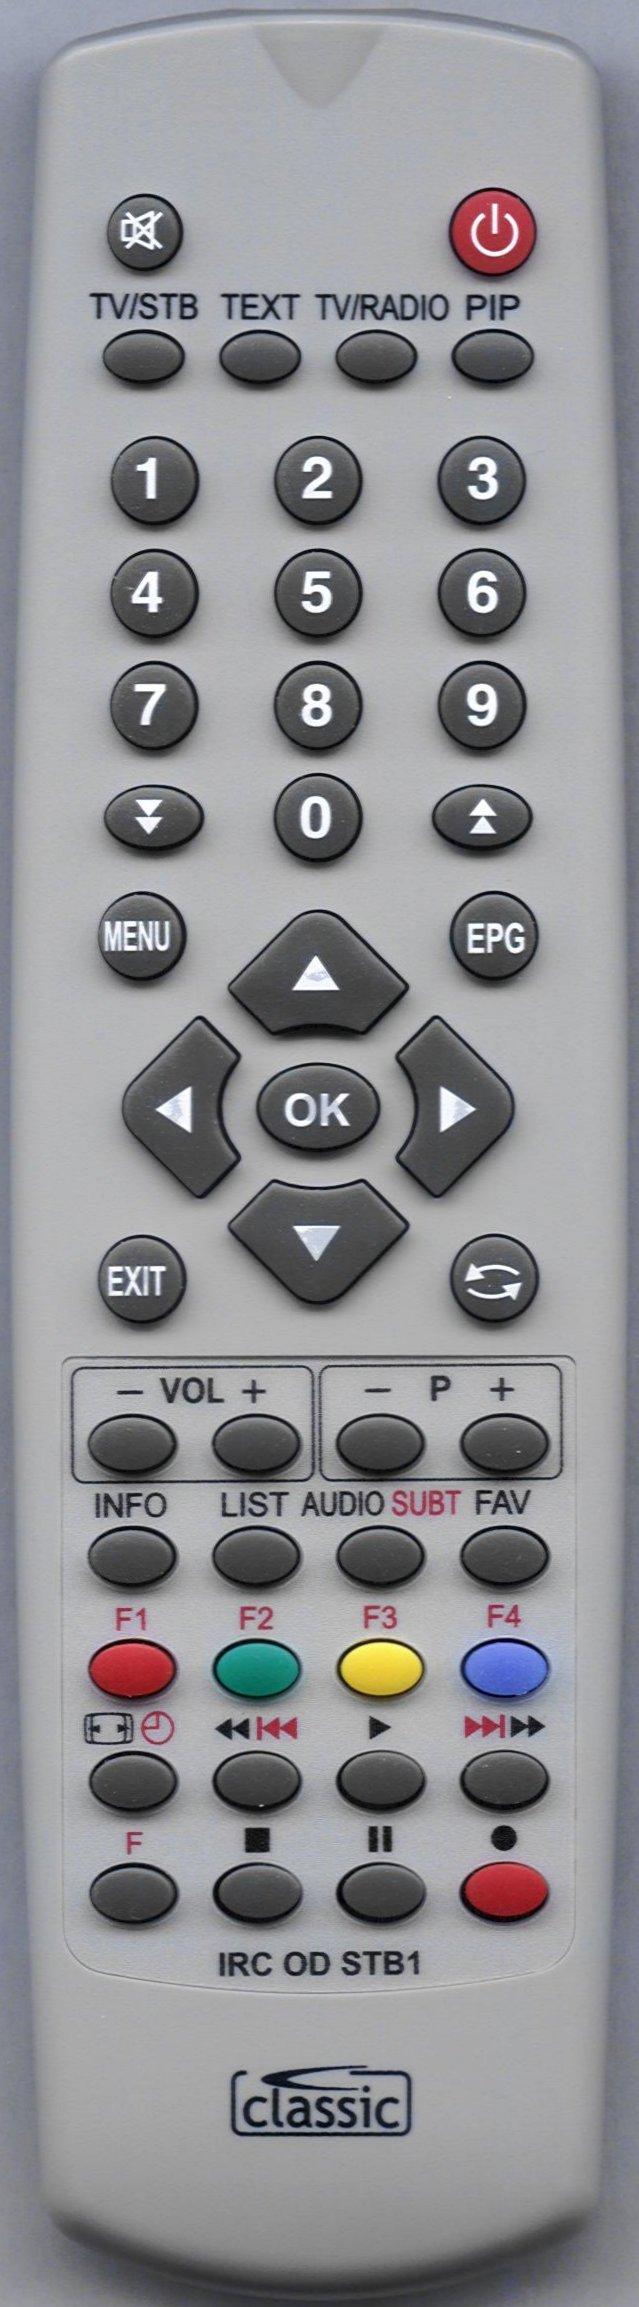 TVONICS T215 Remote Control